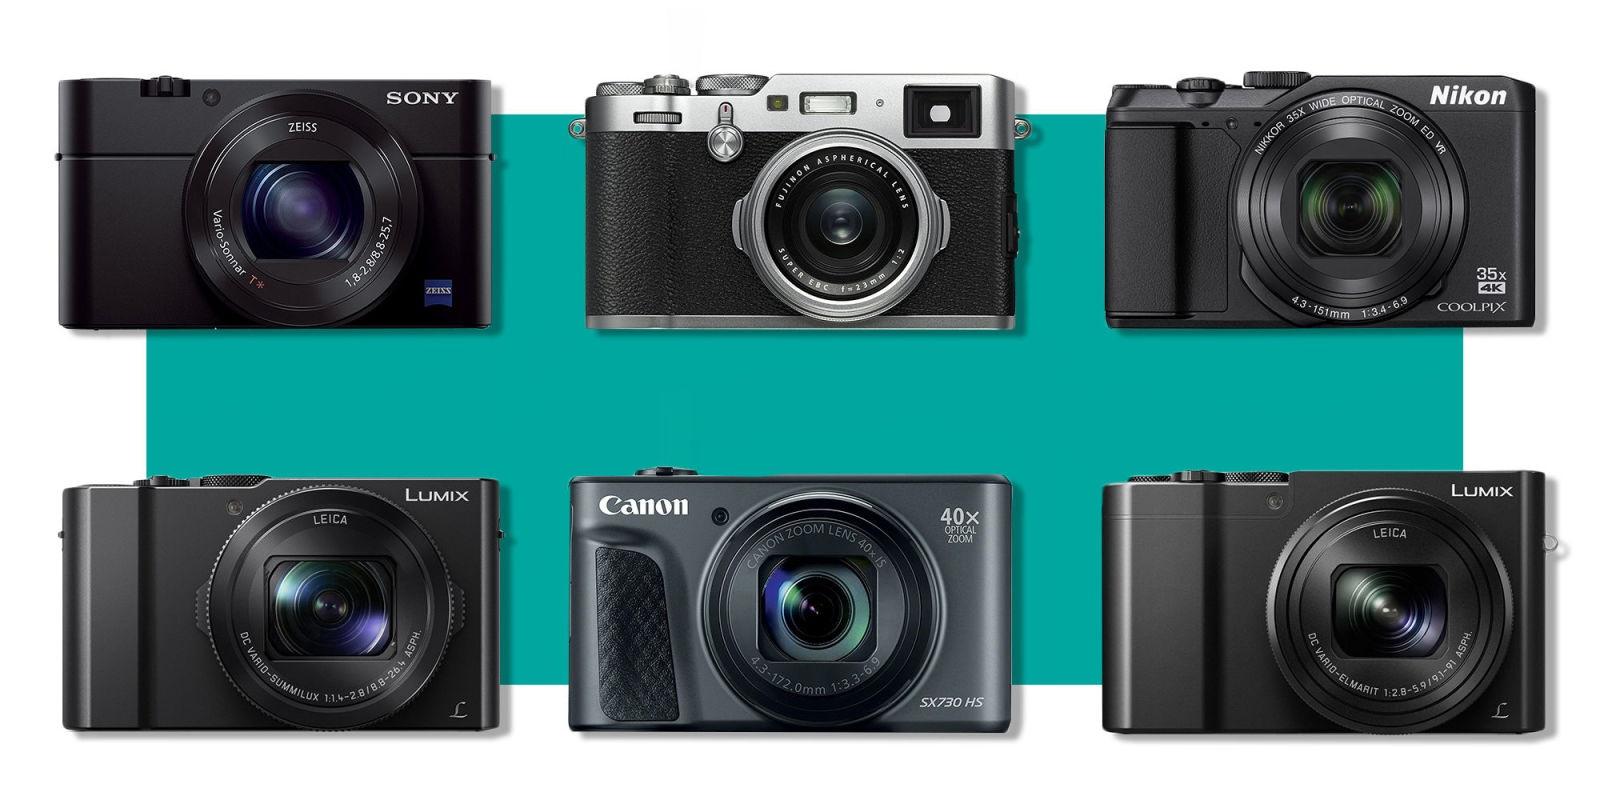 Vyberáme kompaktný fotoaparát